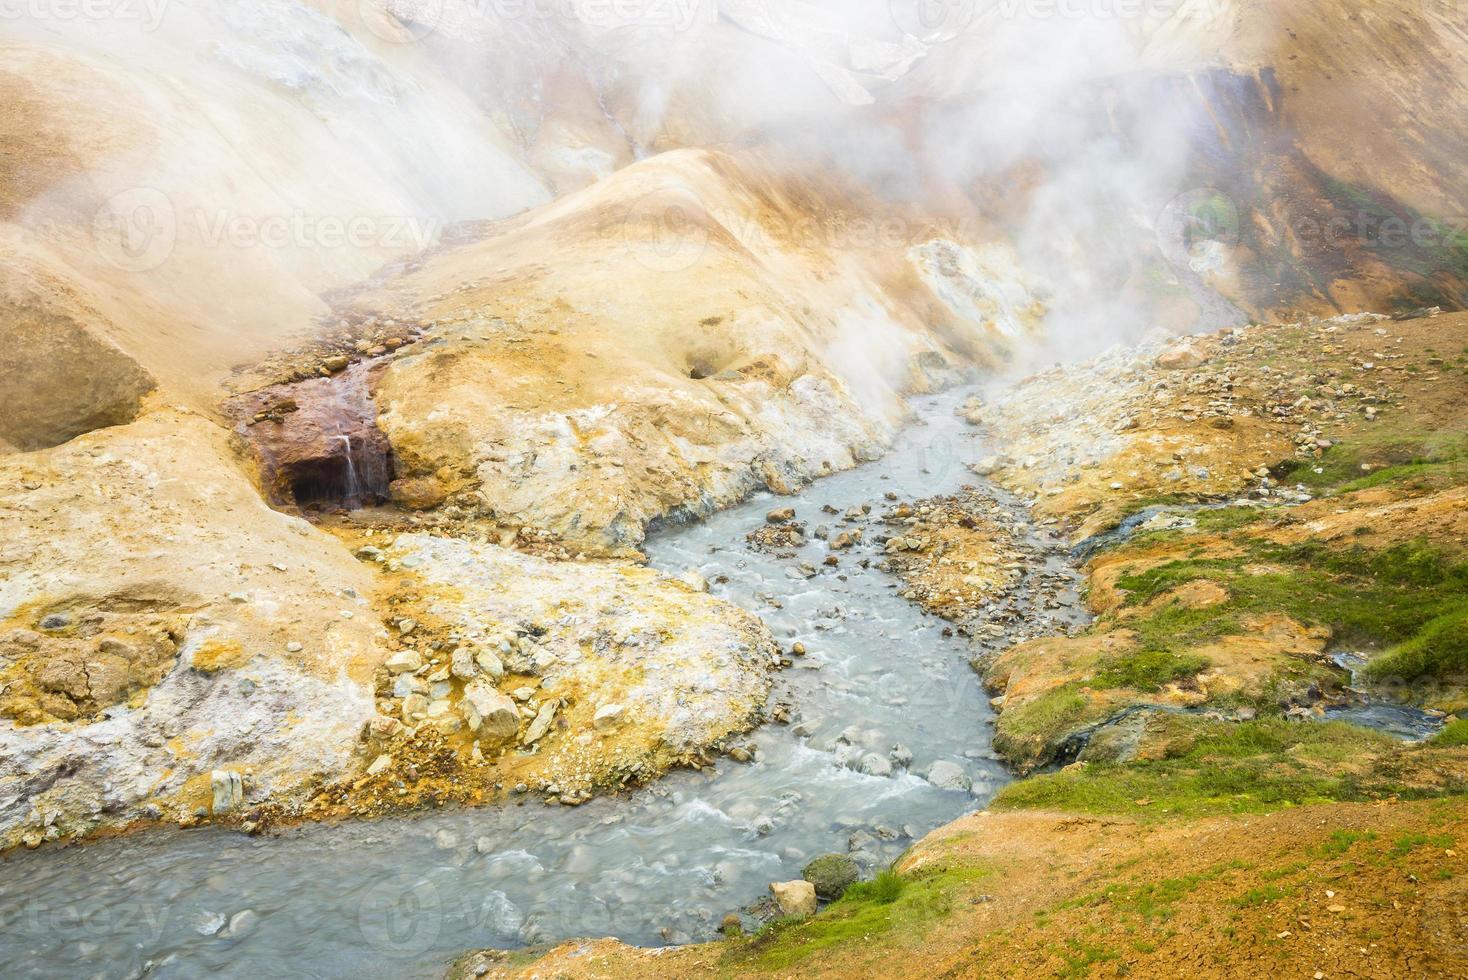 hveradalir, hot spring valley in kerlingarfjoll area, iceland foto